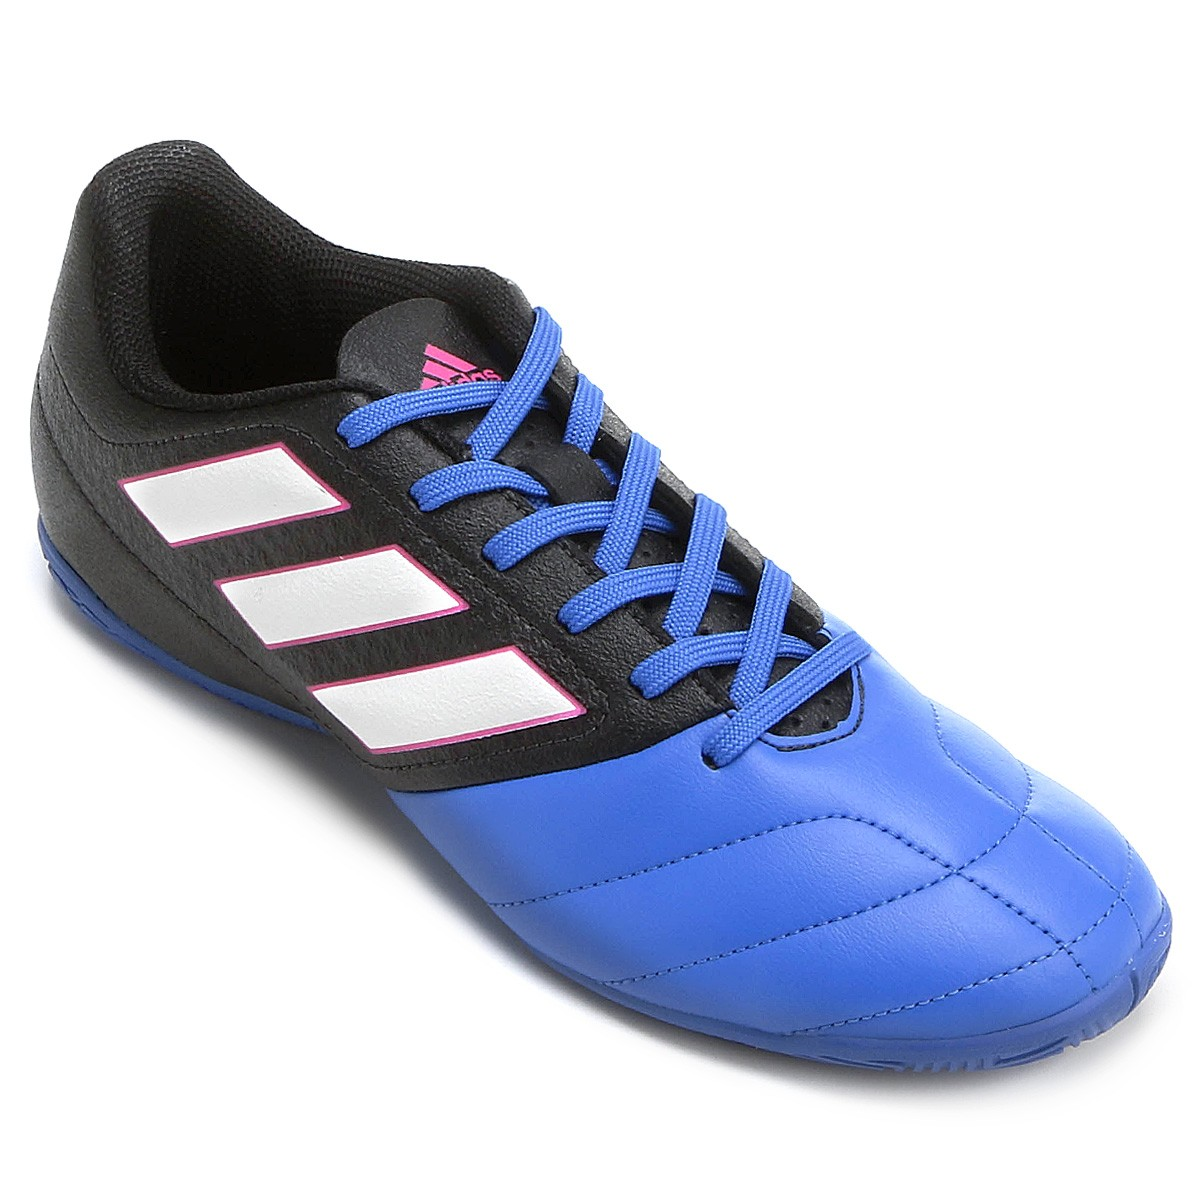 Tenis Adidas Ace 17.4 in  4d631bd64ac3b